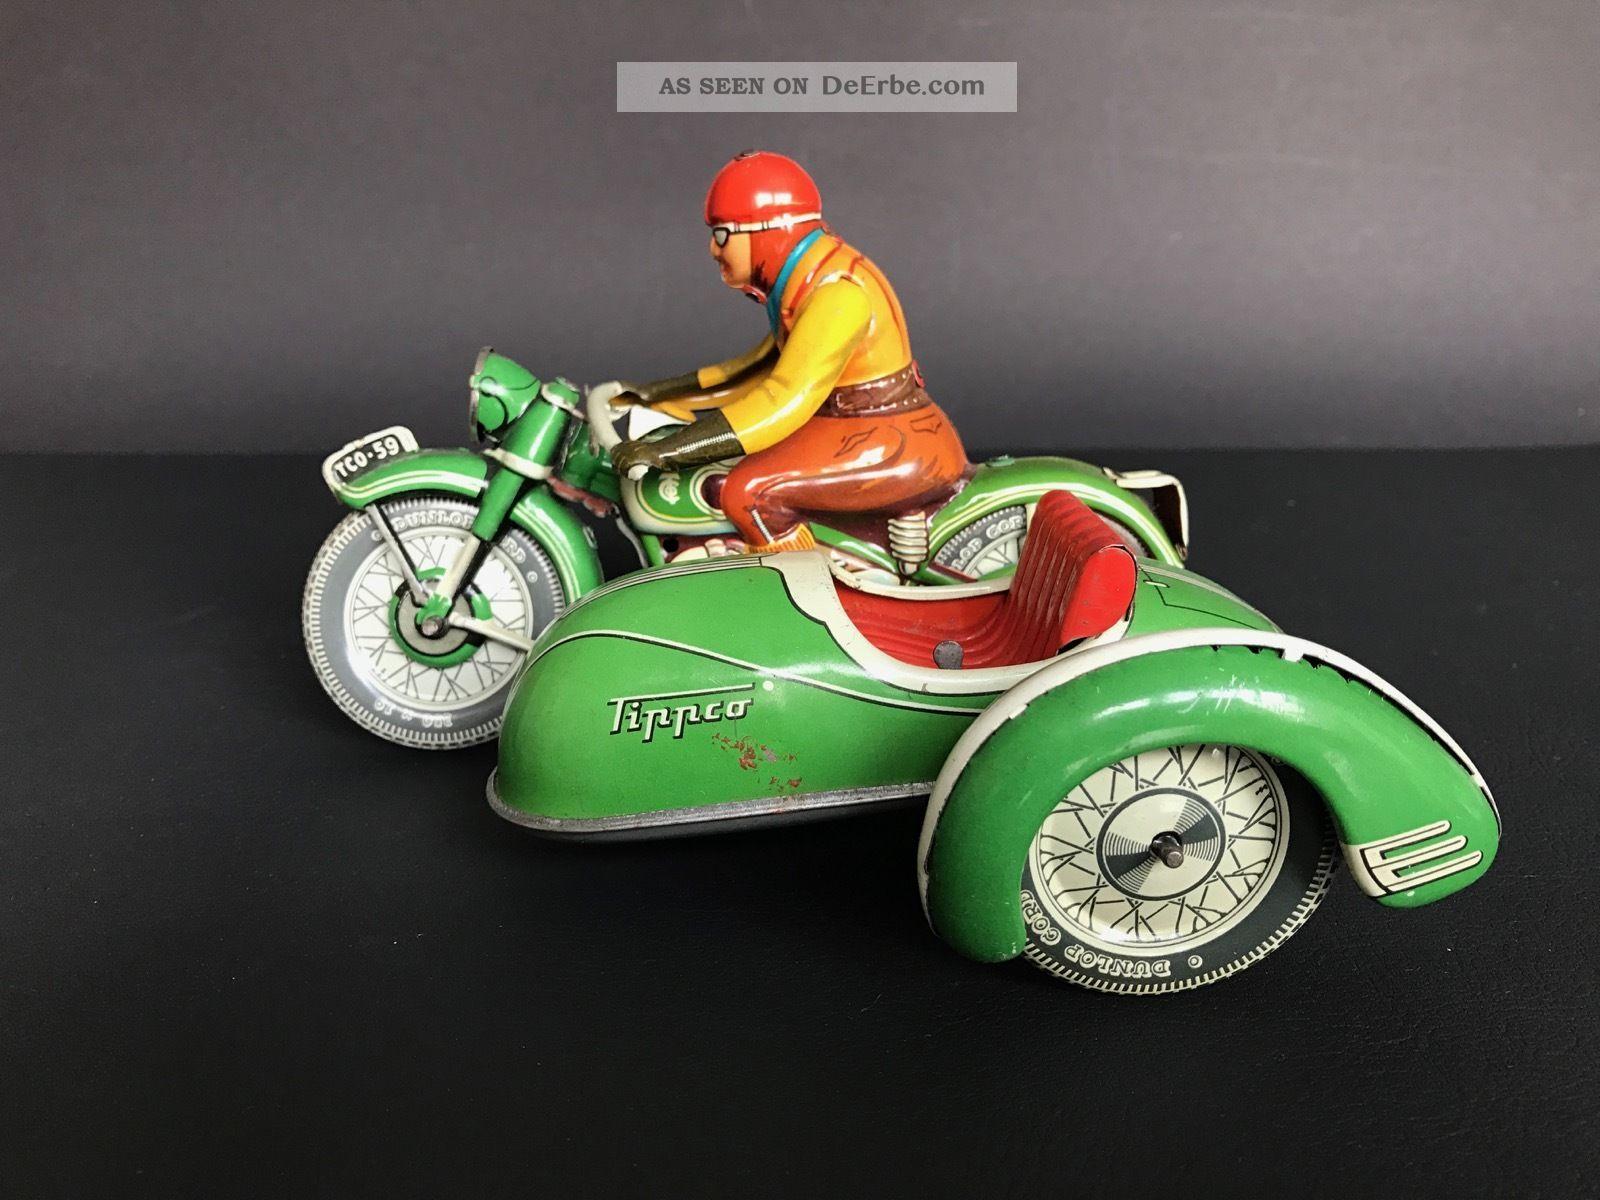 Tippco Motorrad Tco - 59 Original, gefertigt 1945-1970 Bild